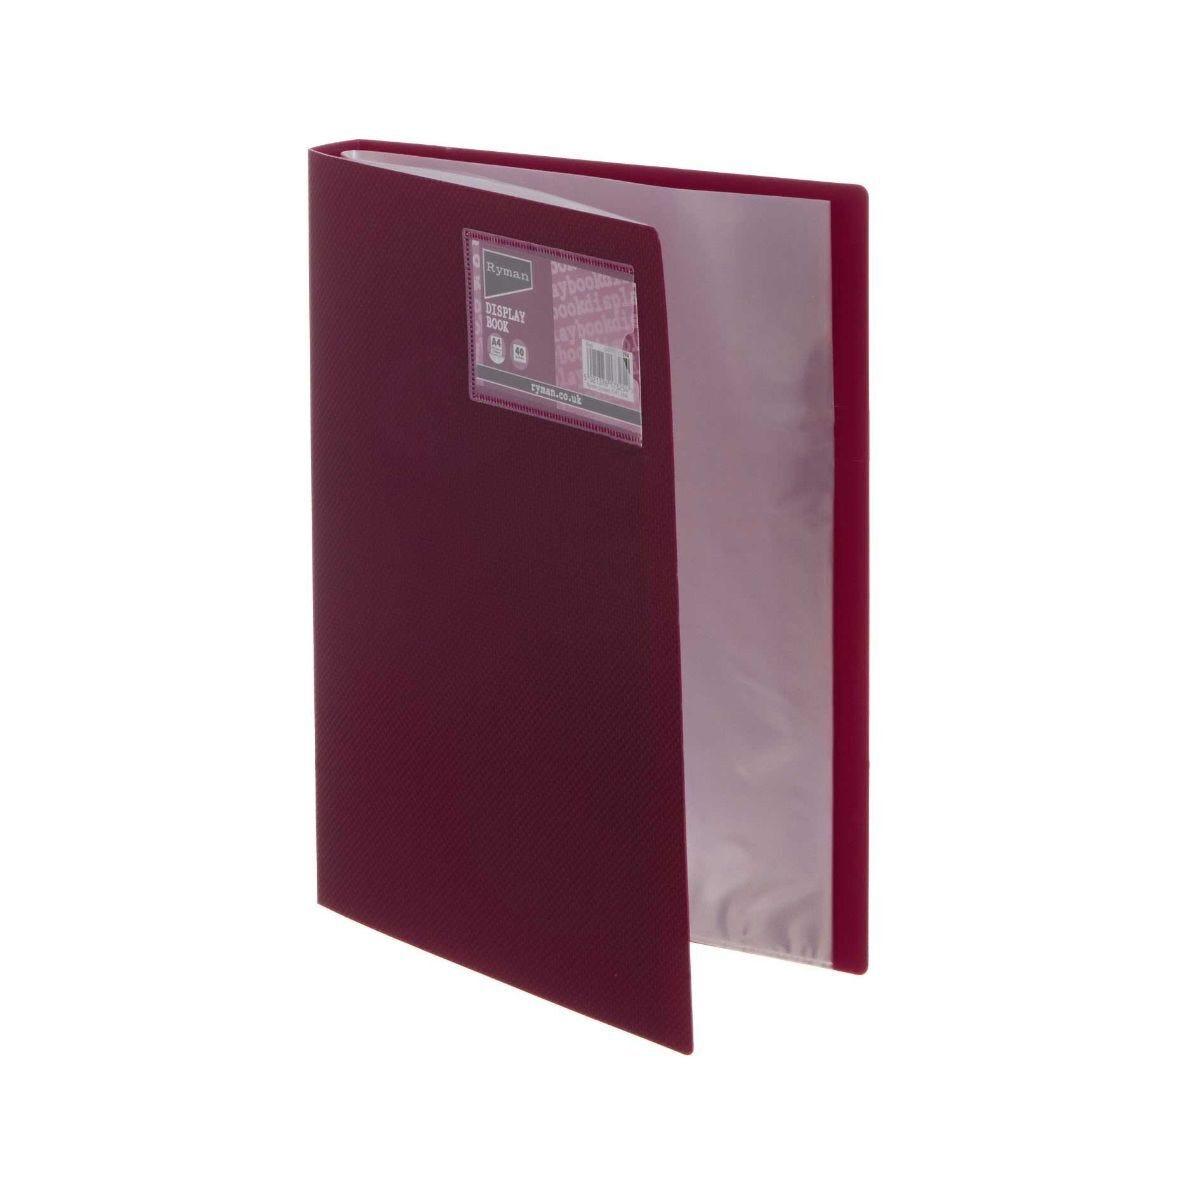 Ryman Display Book A4 40 Pocket Red